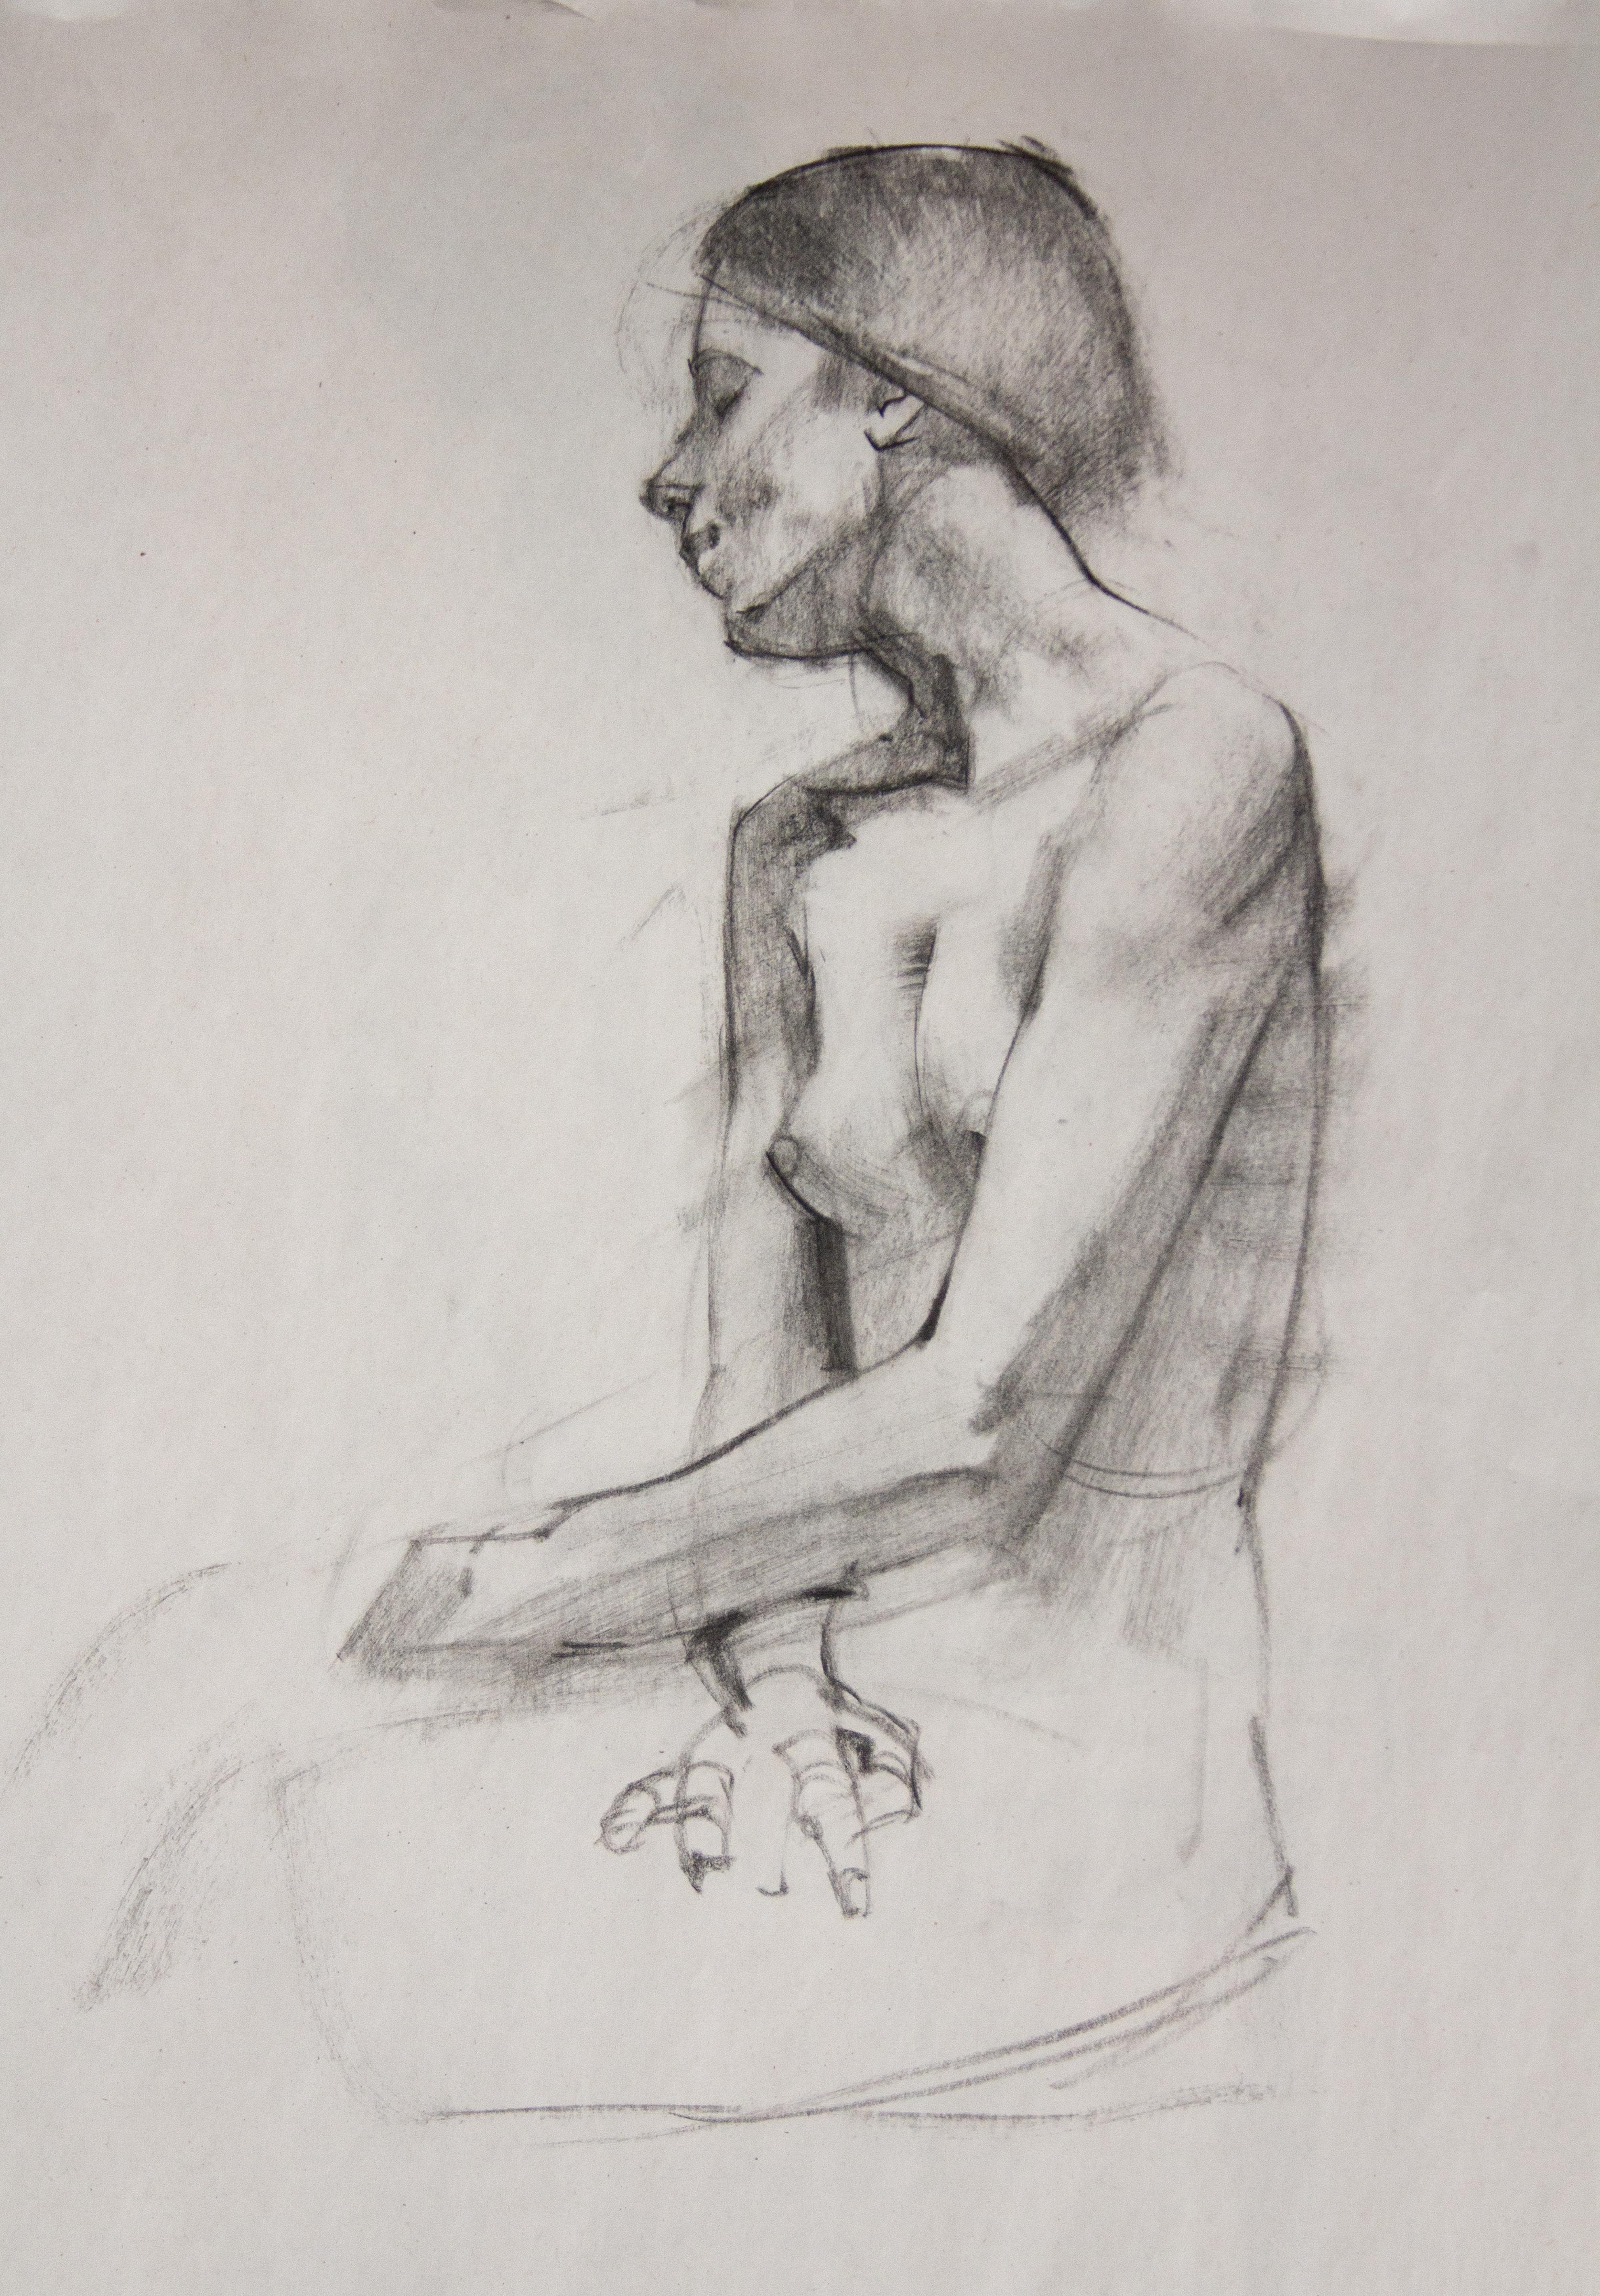 Female Study - Charcoal